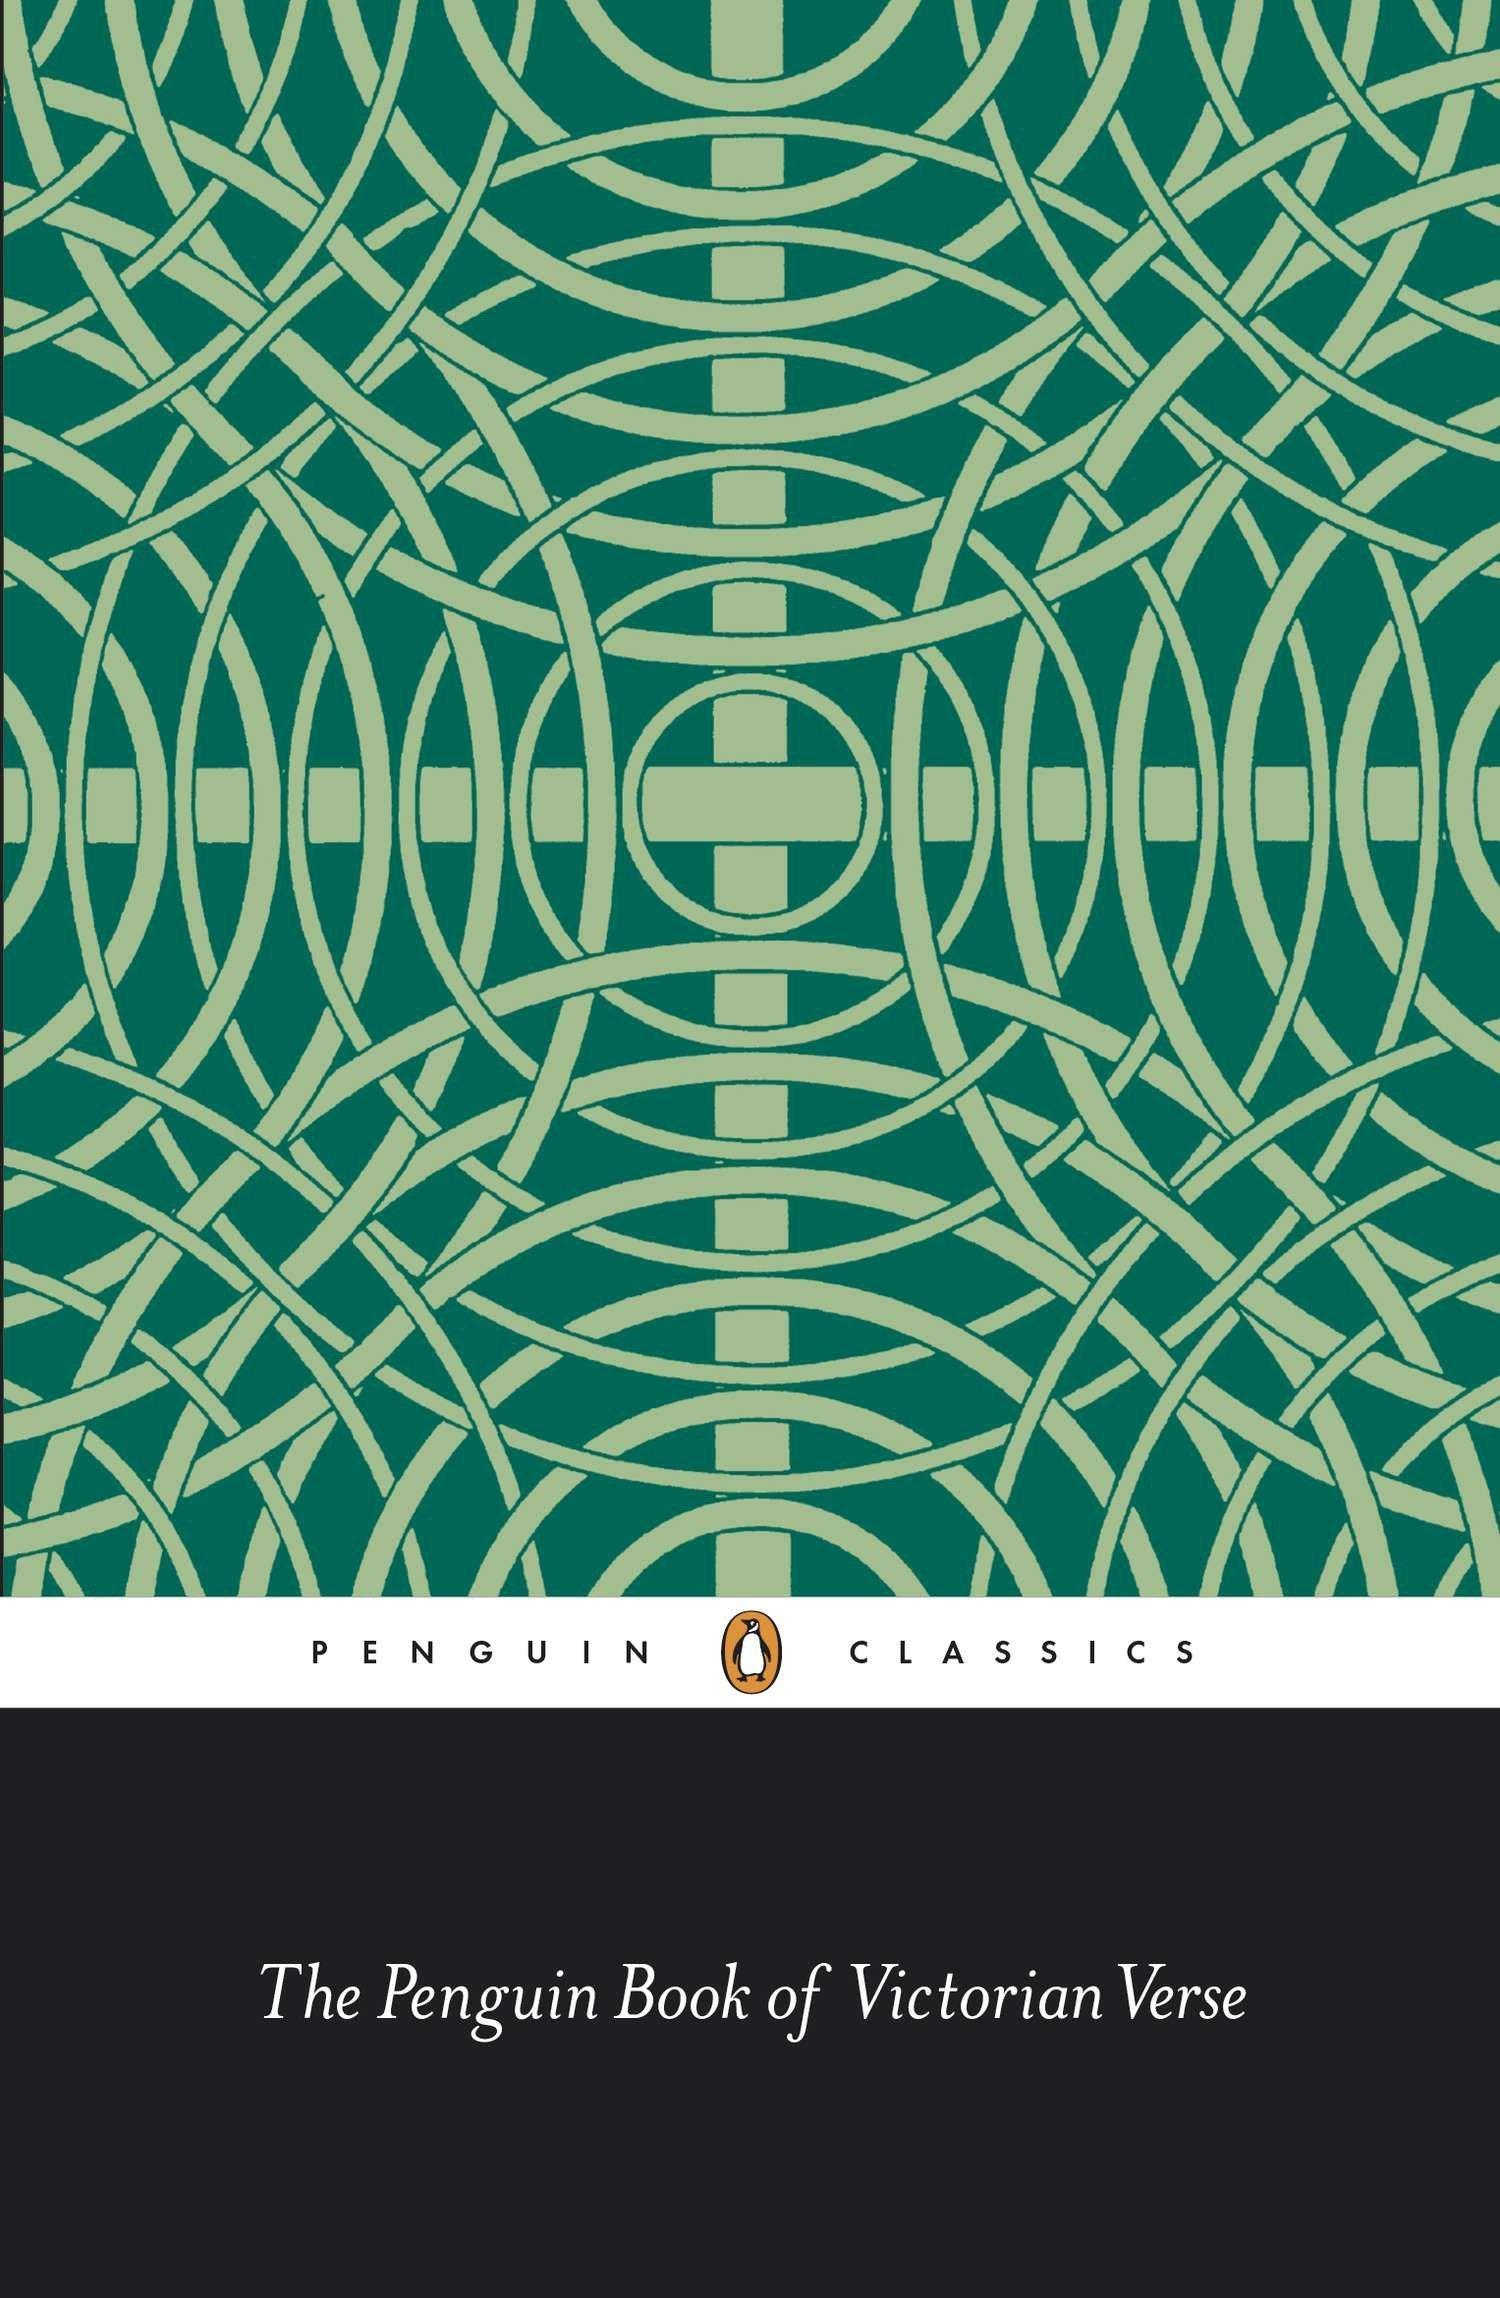 Amazon.com: The Penguin Book of Victorian Verse (Classic, 20th ...